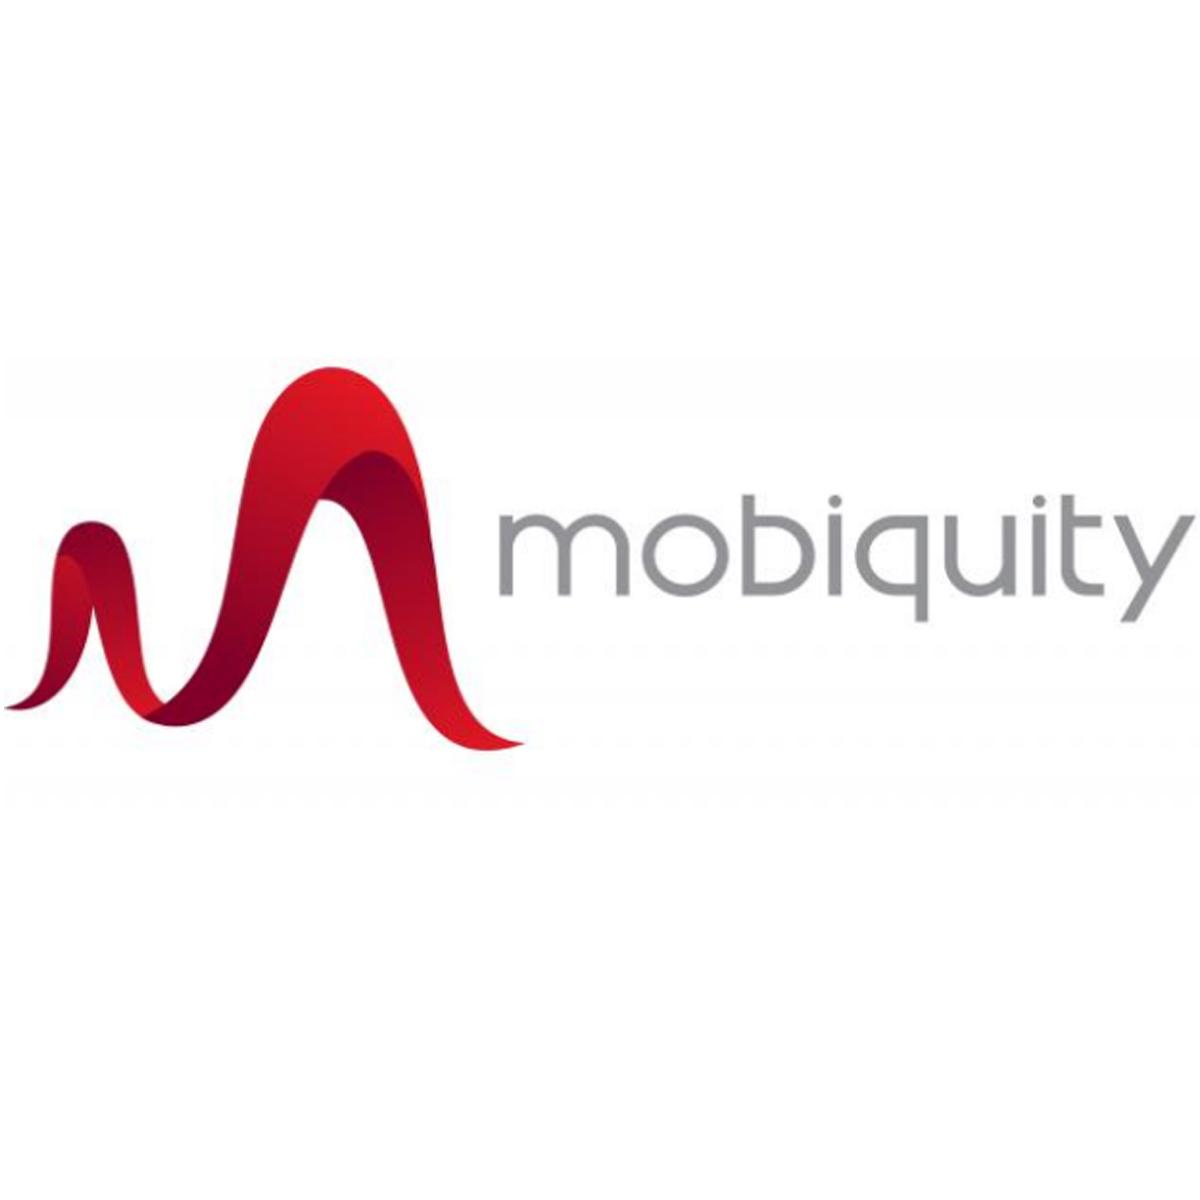 mobiquity Sq.jpg